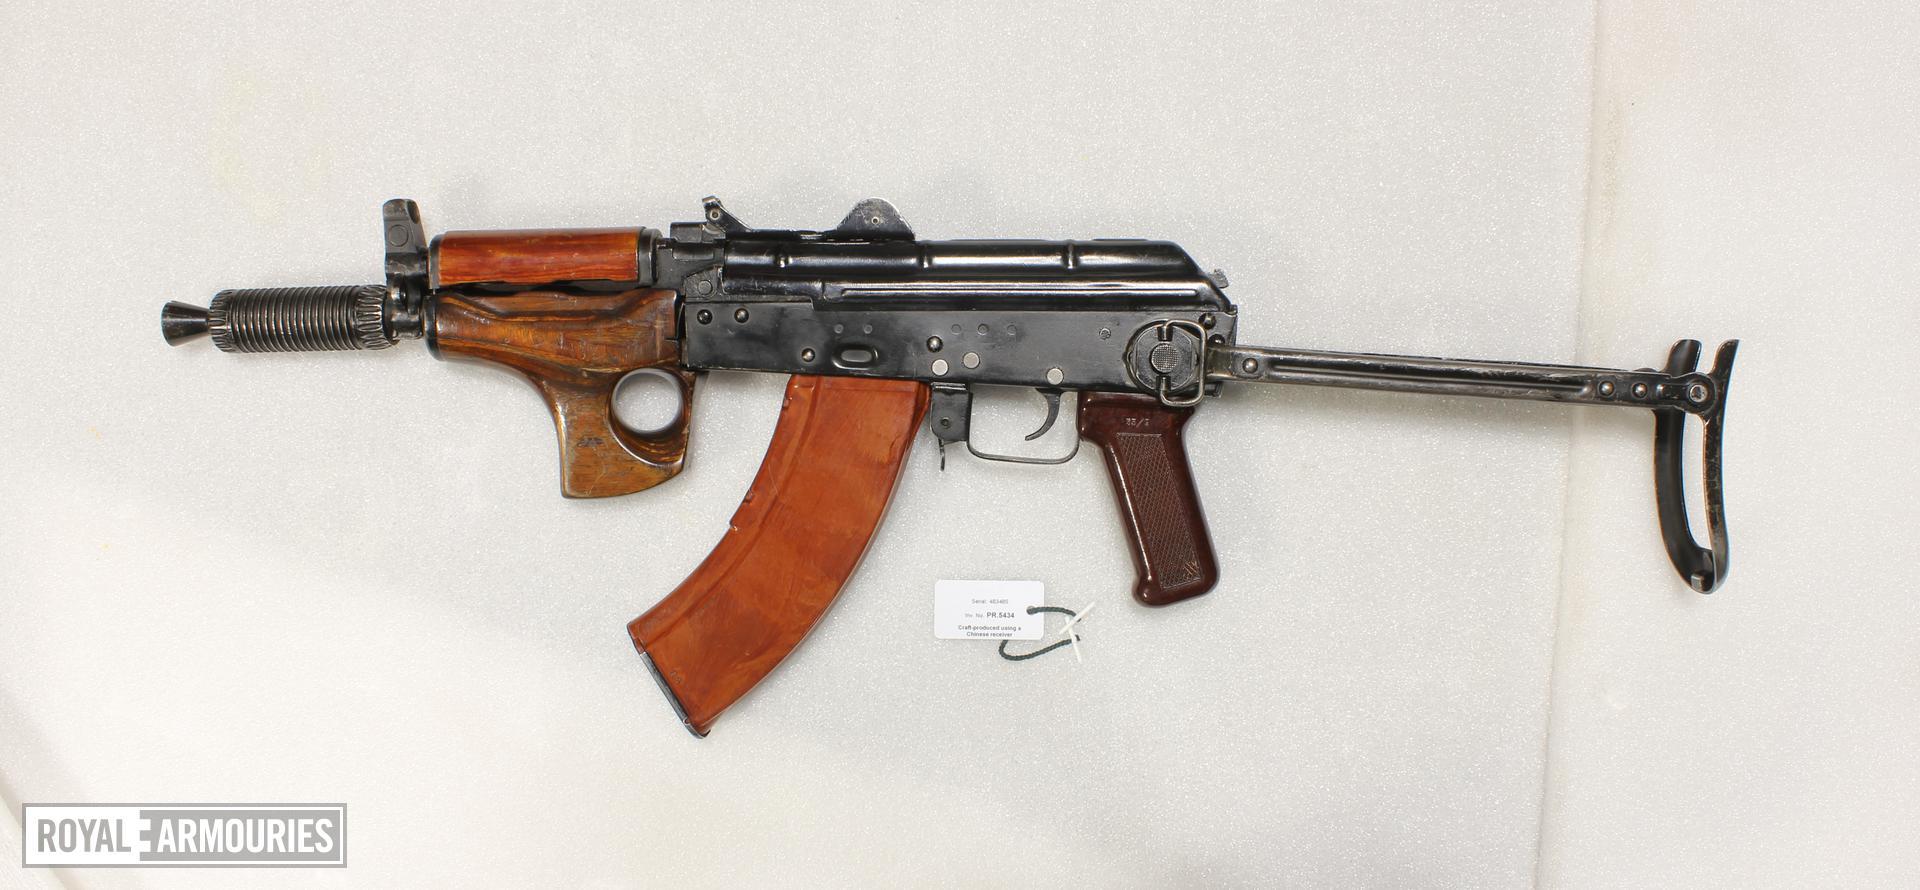 Centrefire automatic rifle - Kalashnikov 'AKM SU'